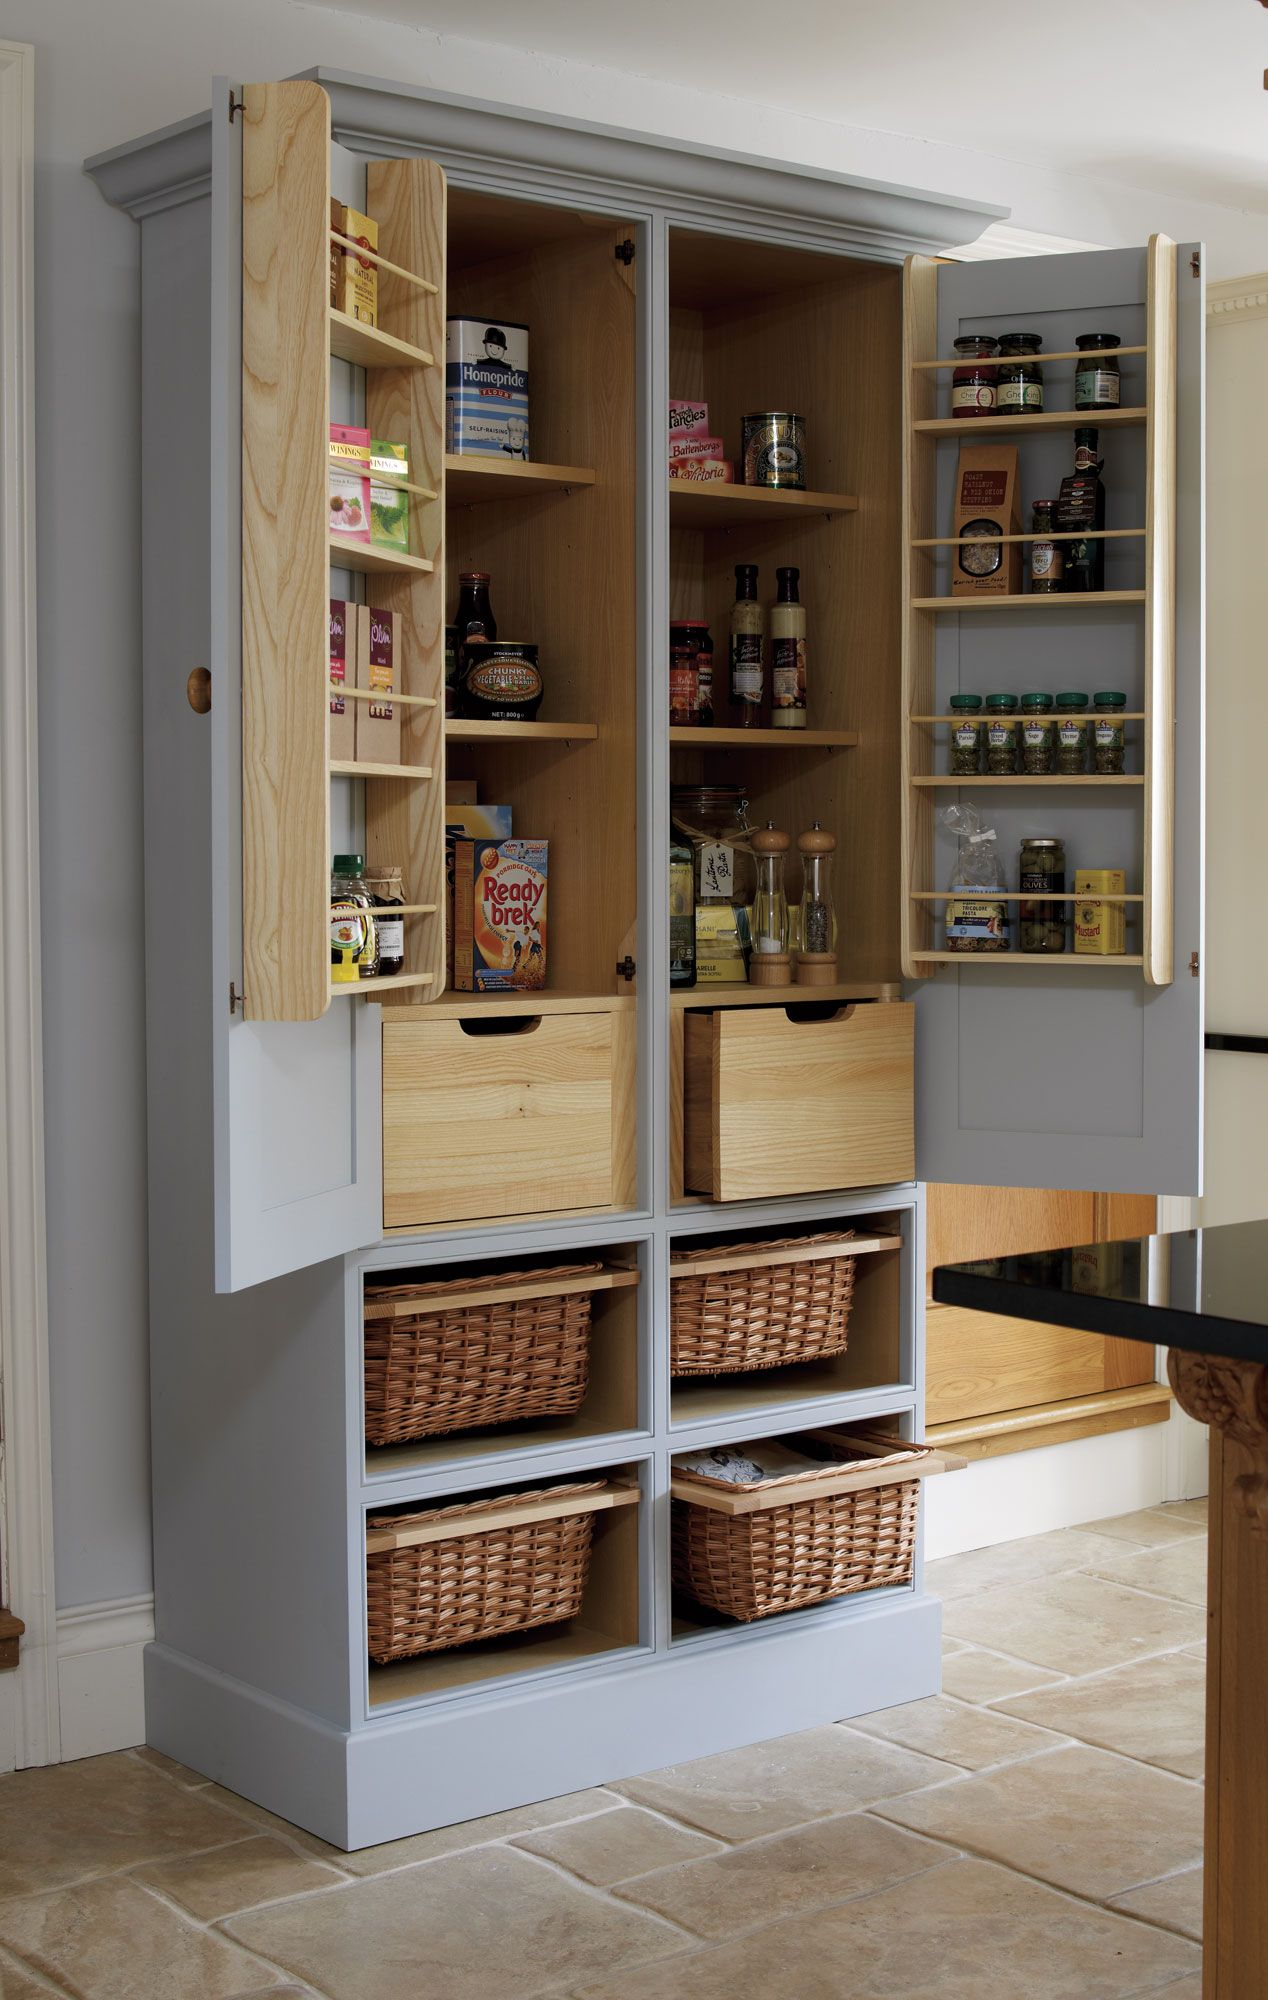 14 Kitchen Organization Ideas Free Standing Kitchen Pantry